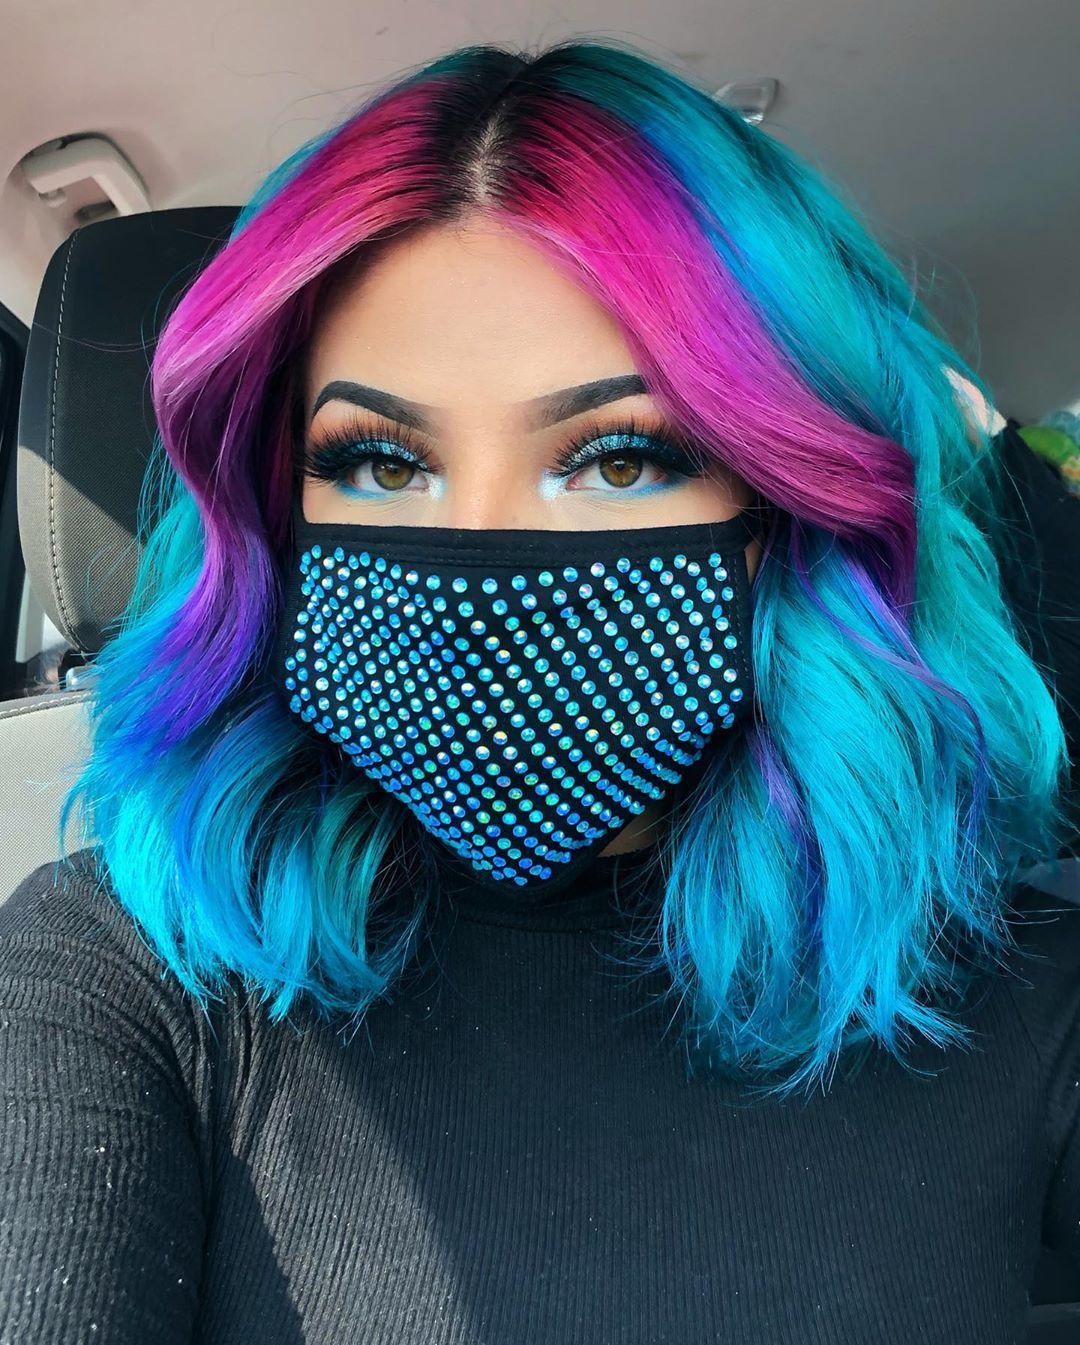 Arctic Fox Hair Color in 2020 | Cool hair color, Diy hair ...